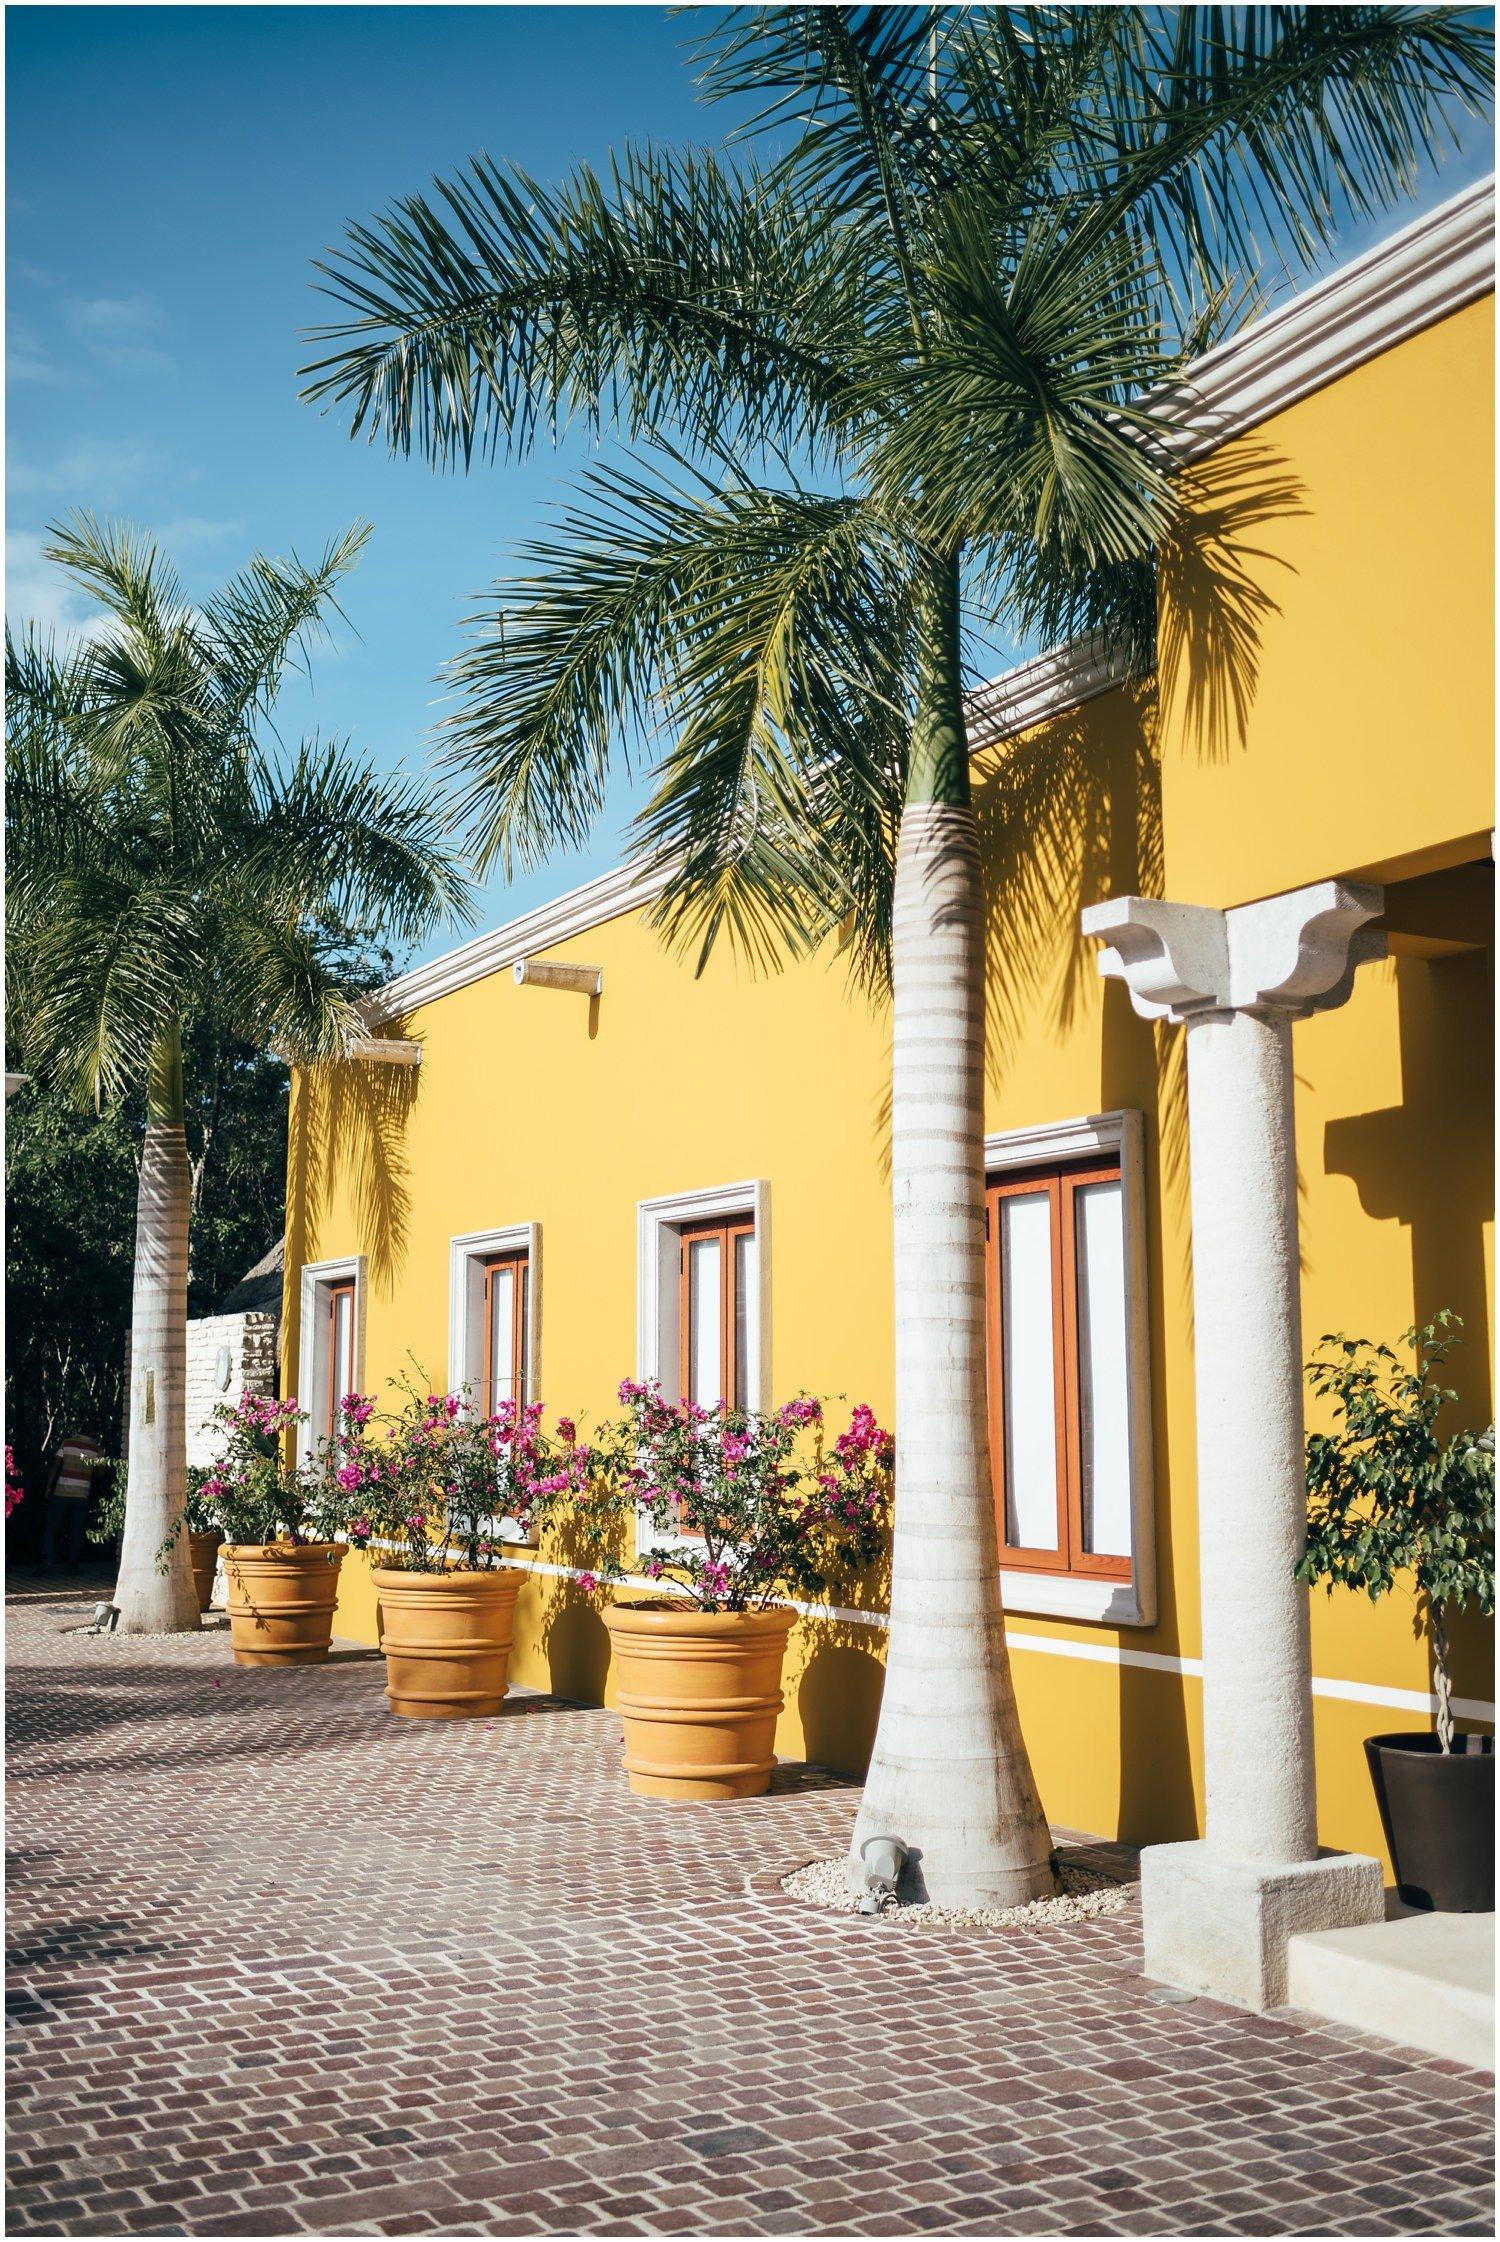 day 1, mayakoba, riviera del carmen, cancun, fairmont, mexico, travel, photography, photographer, playa del carmen, resort, spa, relaxing, fairmont mayakoba, travel tips